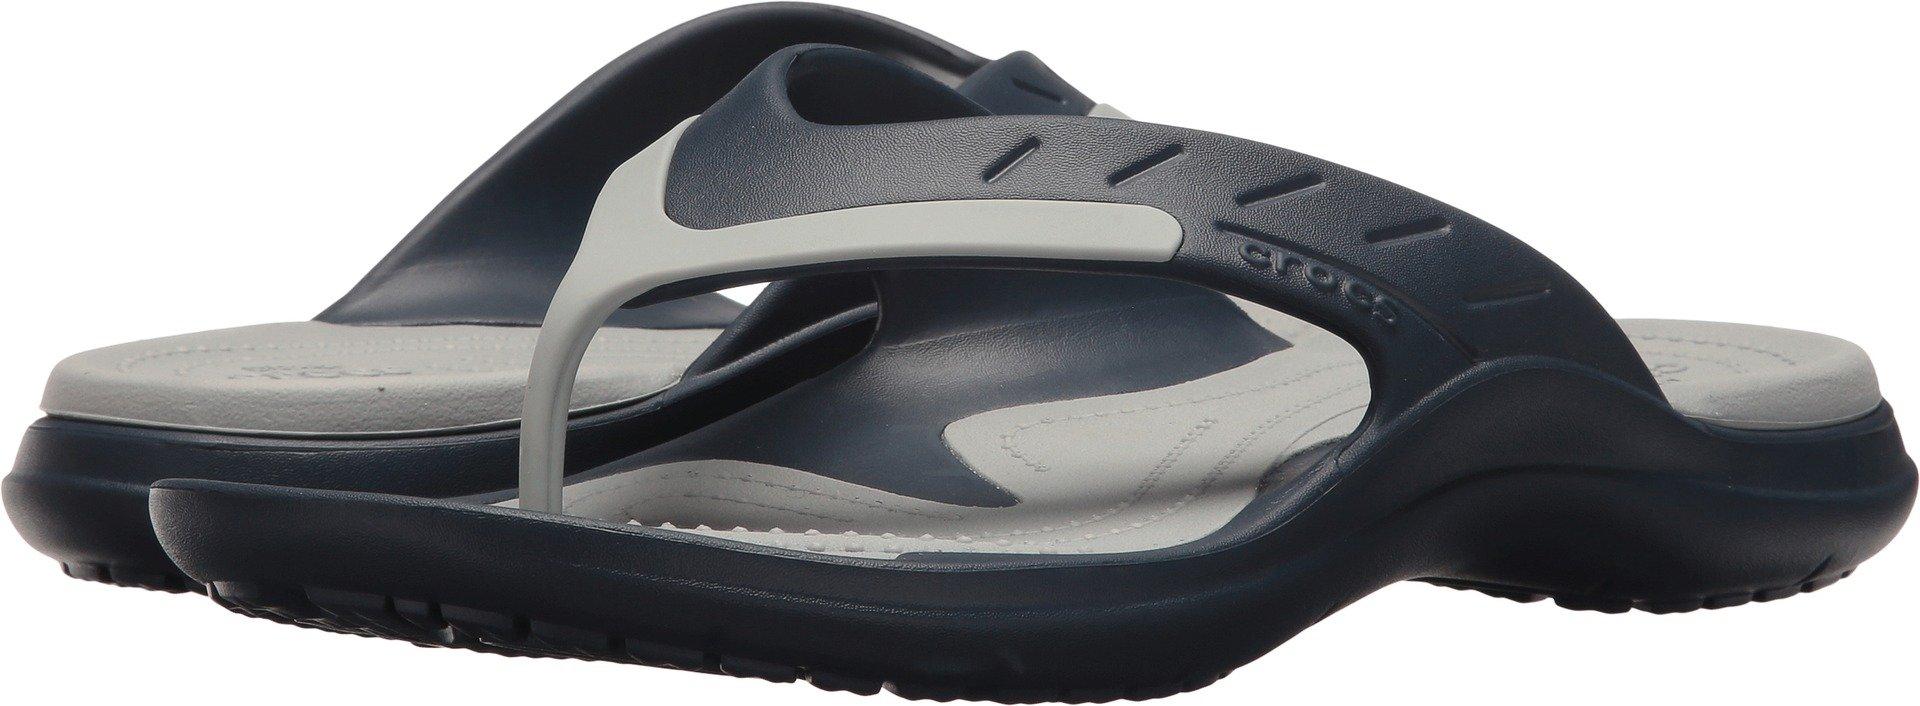 Crocs Modi Flip Sport Sandal, Navy/Light Grey, 12 US Men/14 US Women